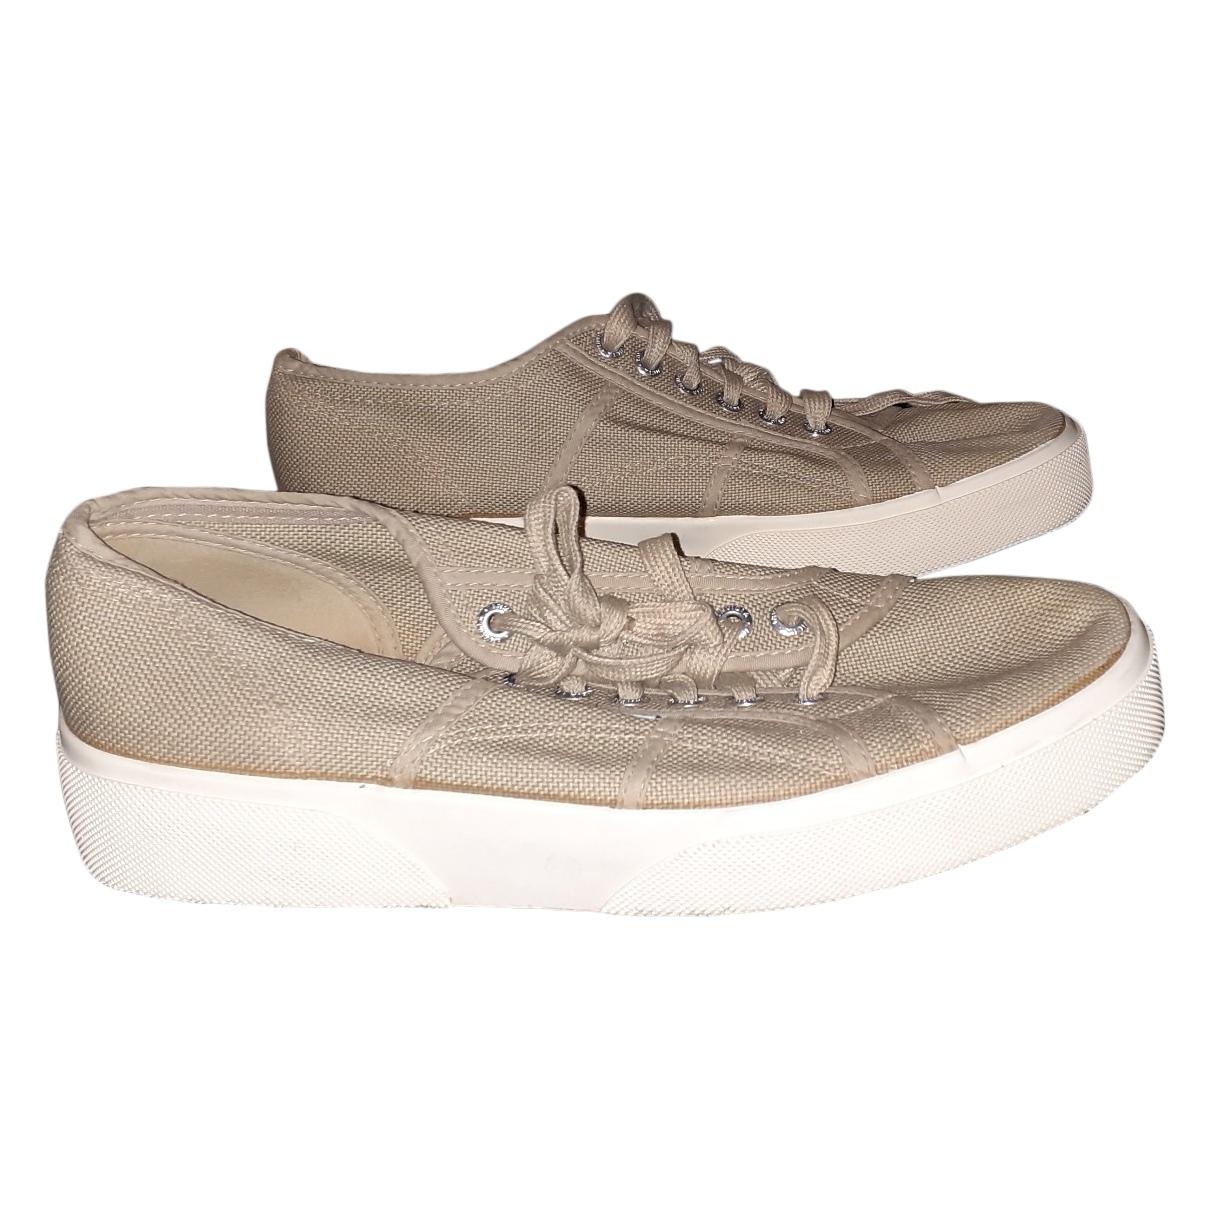 Invicta \N Sneakers in  Beige Leinen